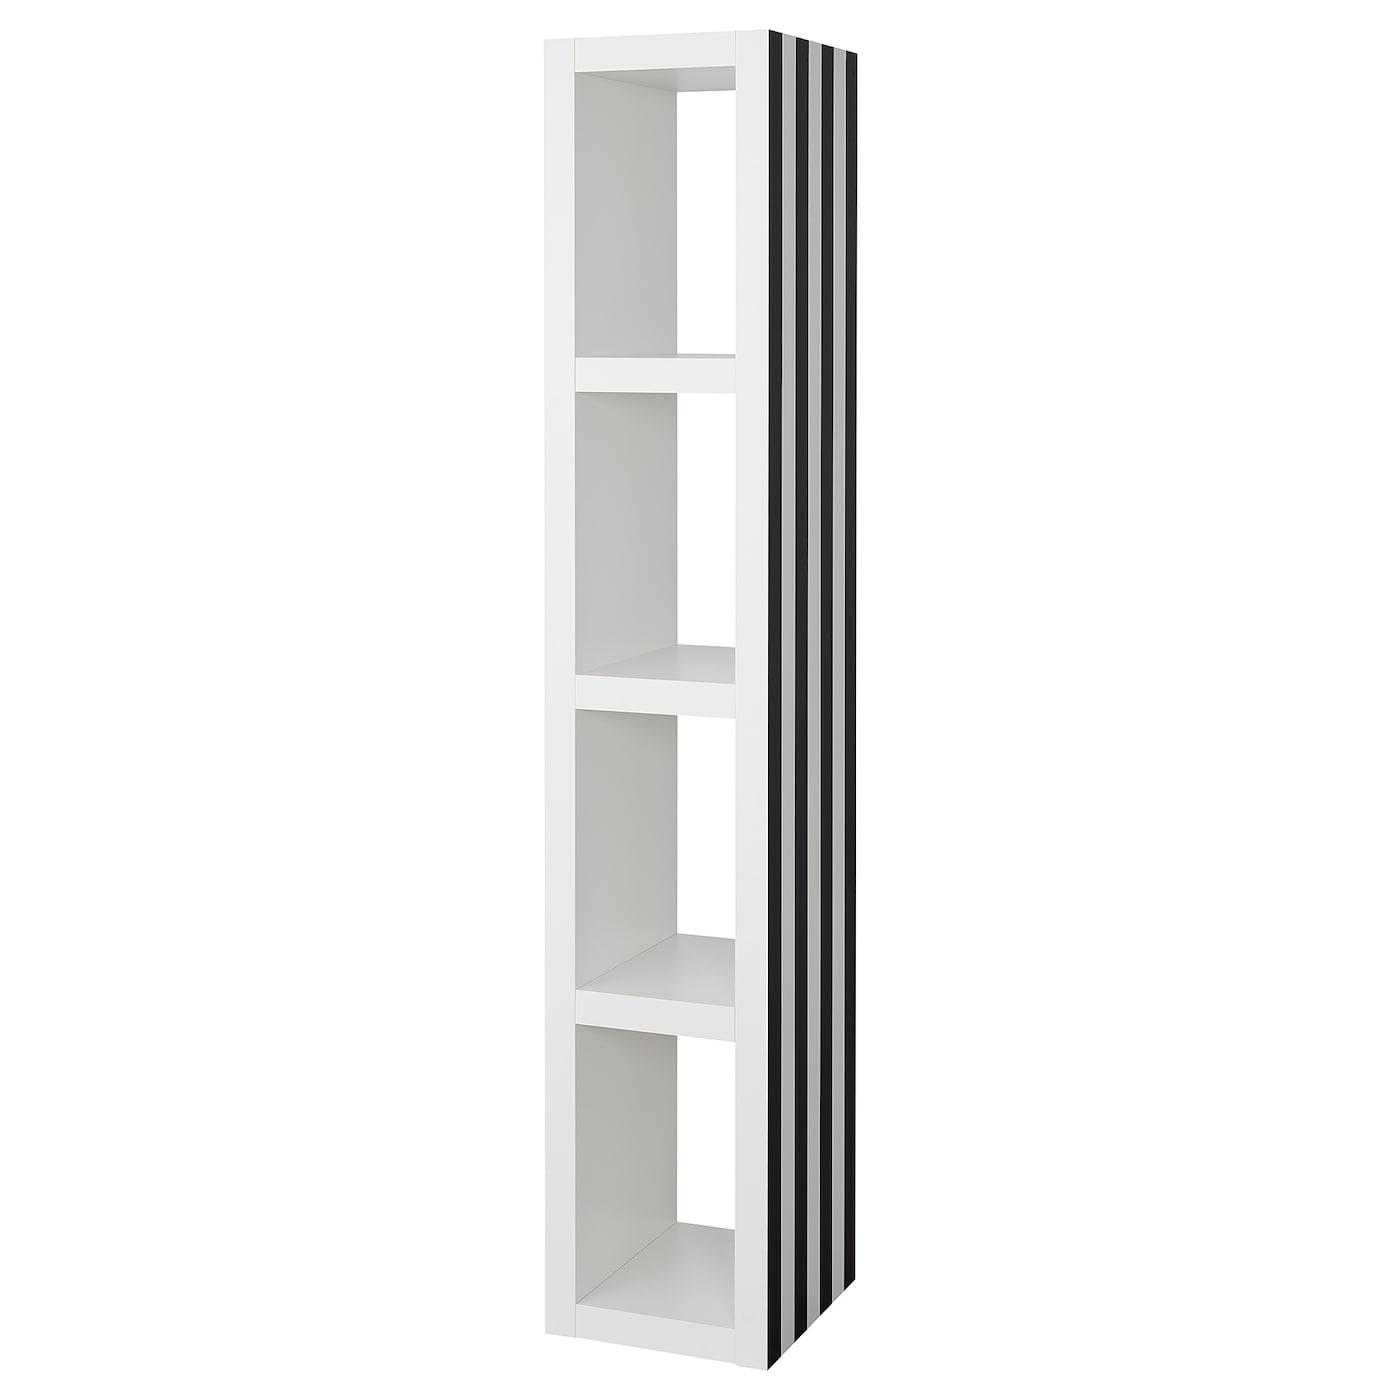 lack shelving unit black white 35 x 190 cm ikea. Black Bedroom Furniture Sets. Home Design Ideas